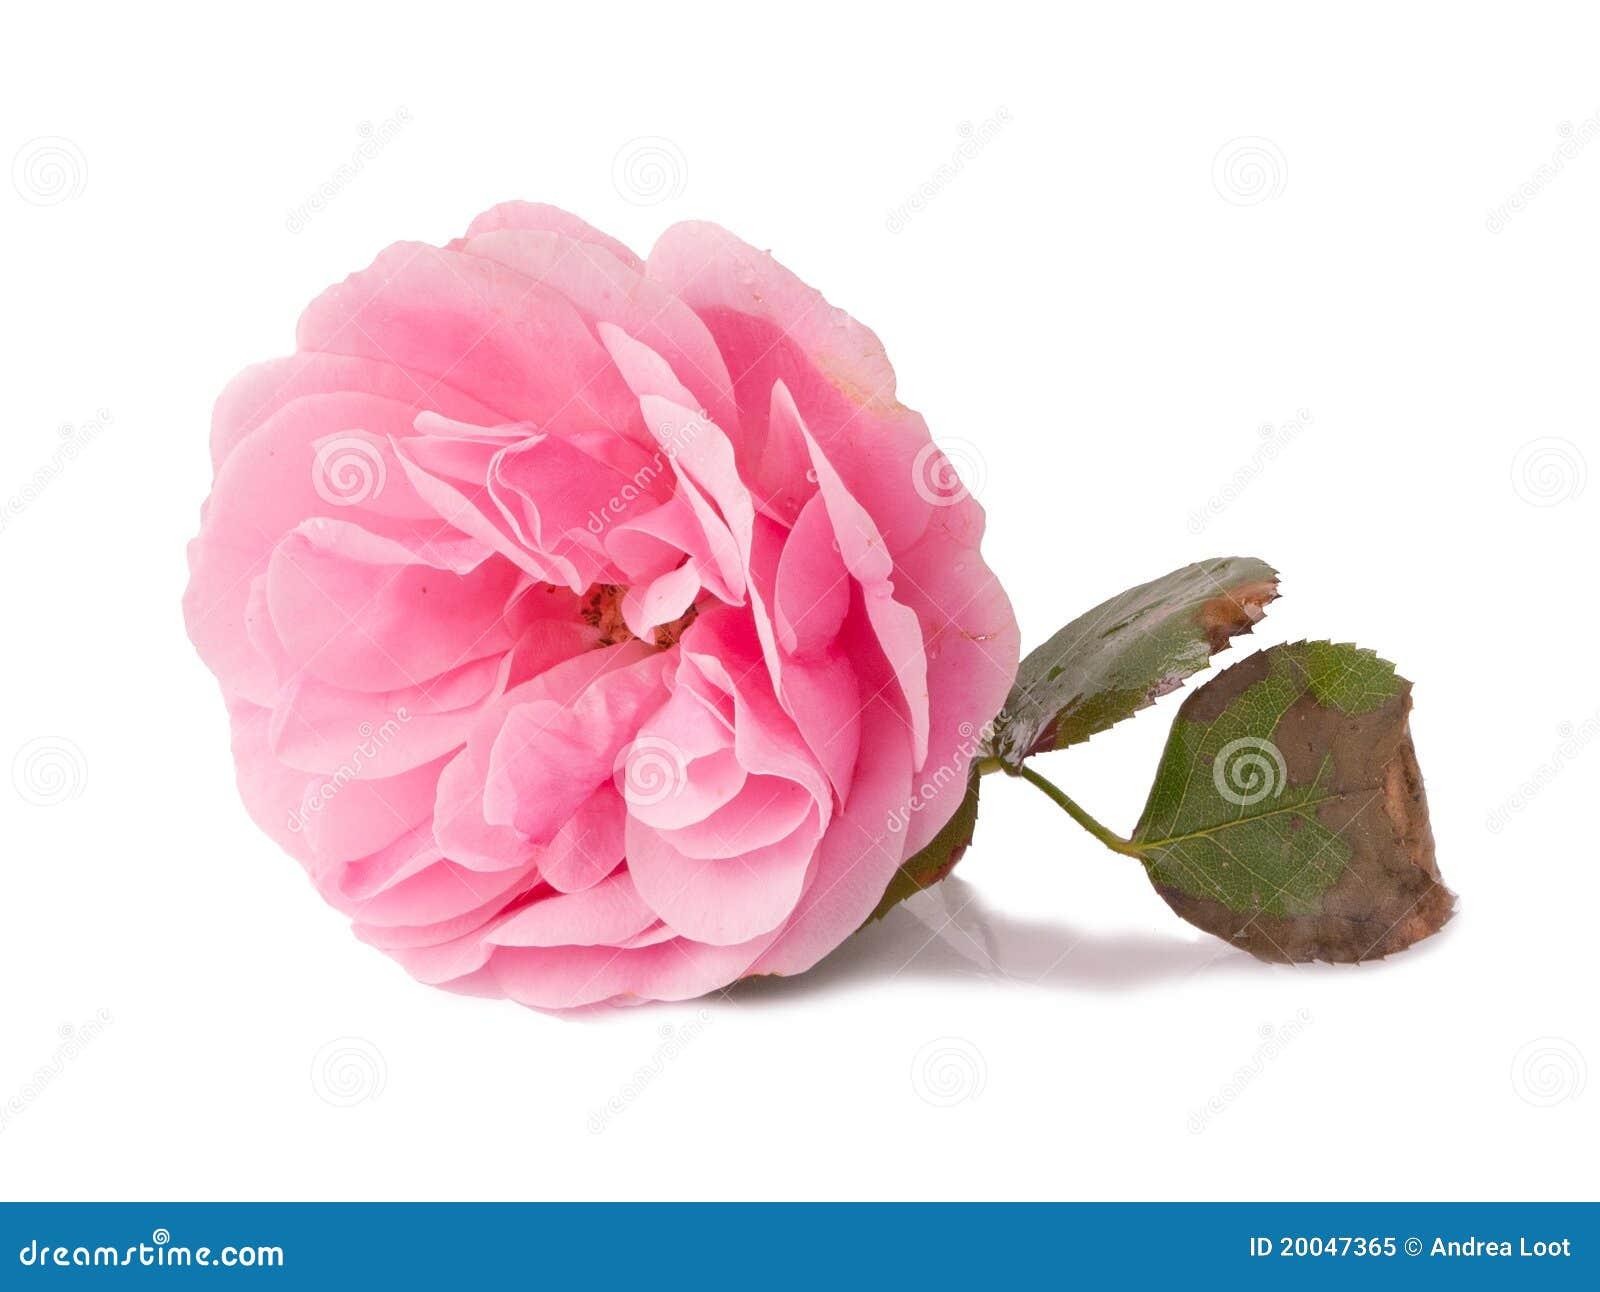 rosa damascena stock image  image of petals  rosa  plant